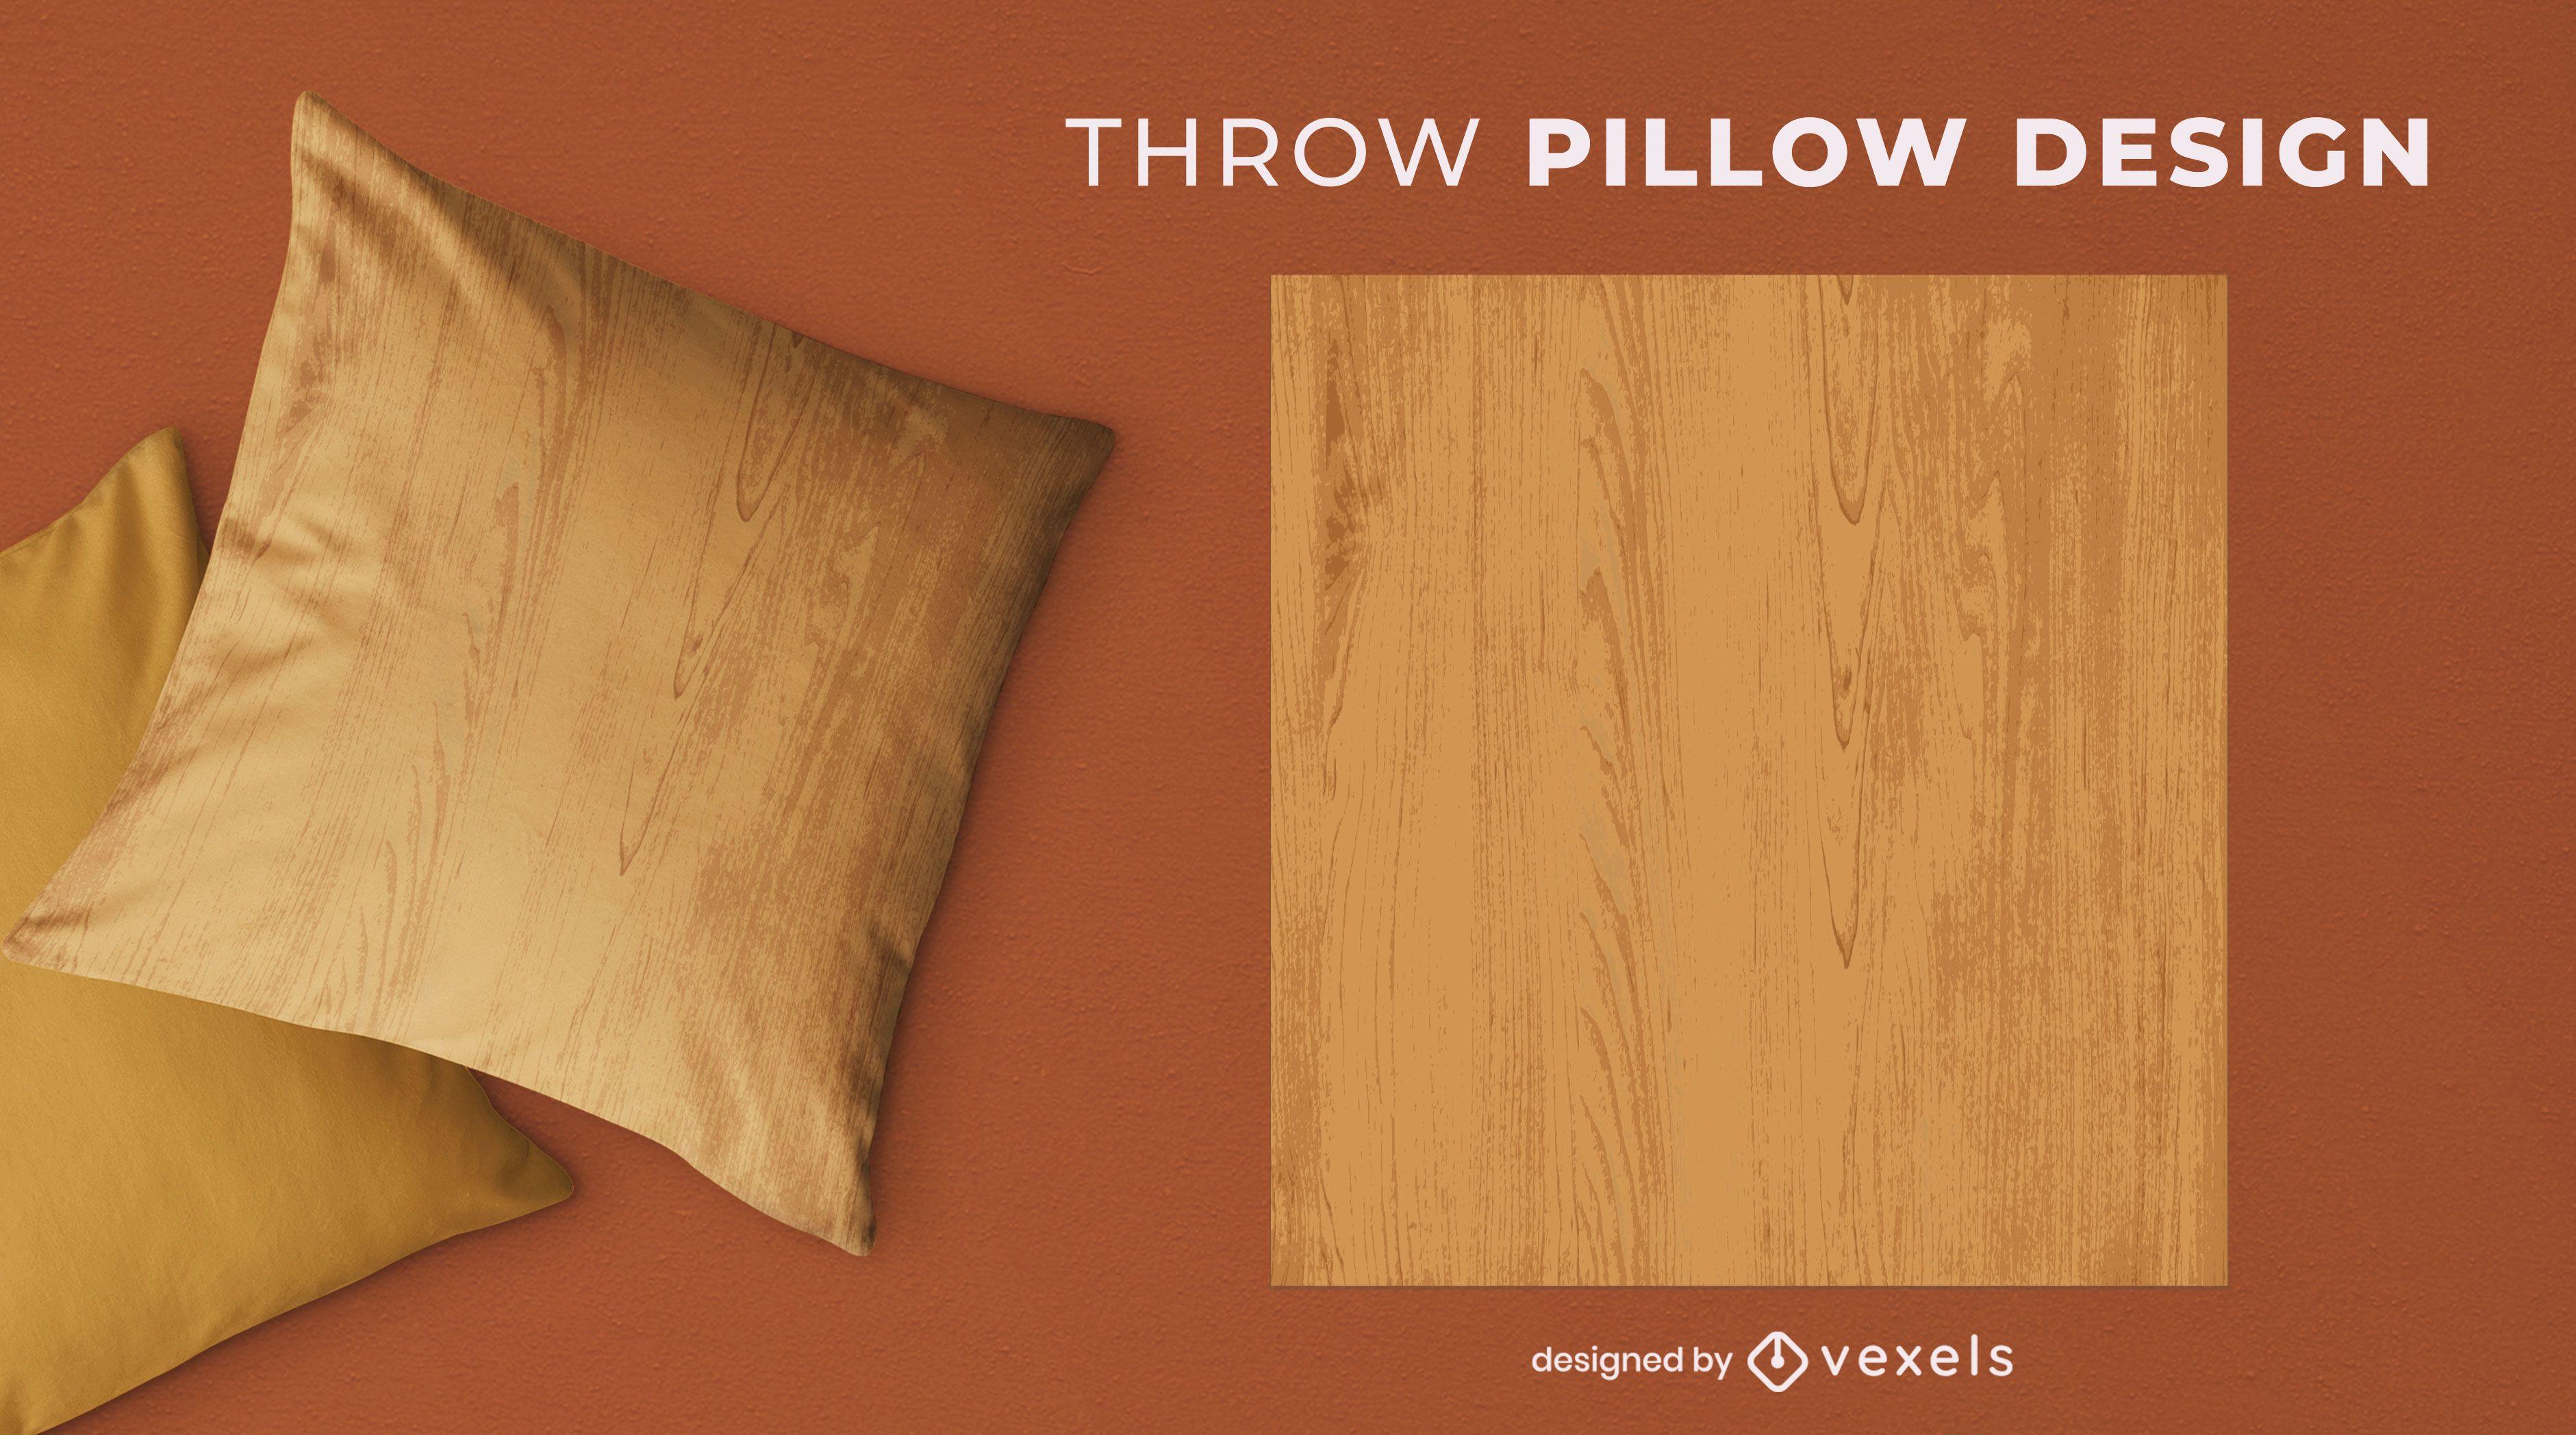 Wood grain throw pillow design